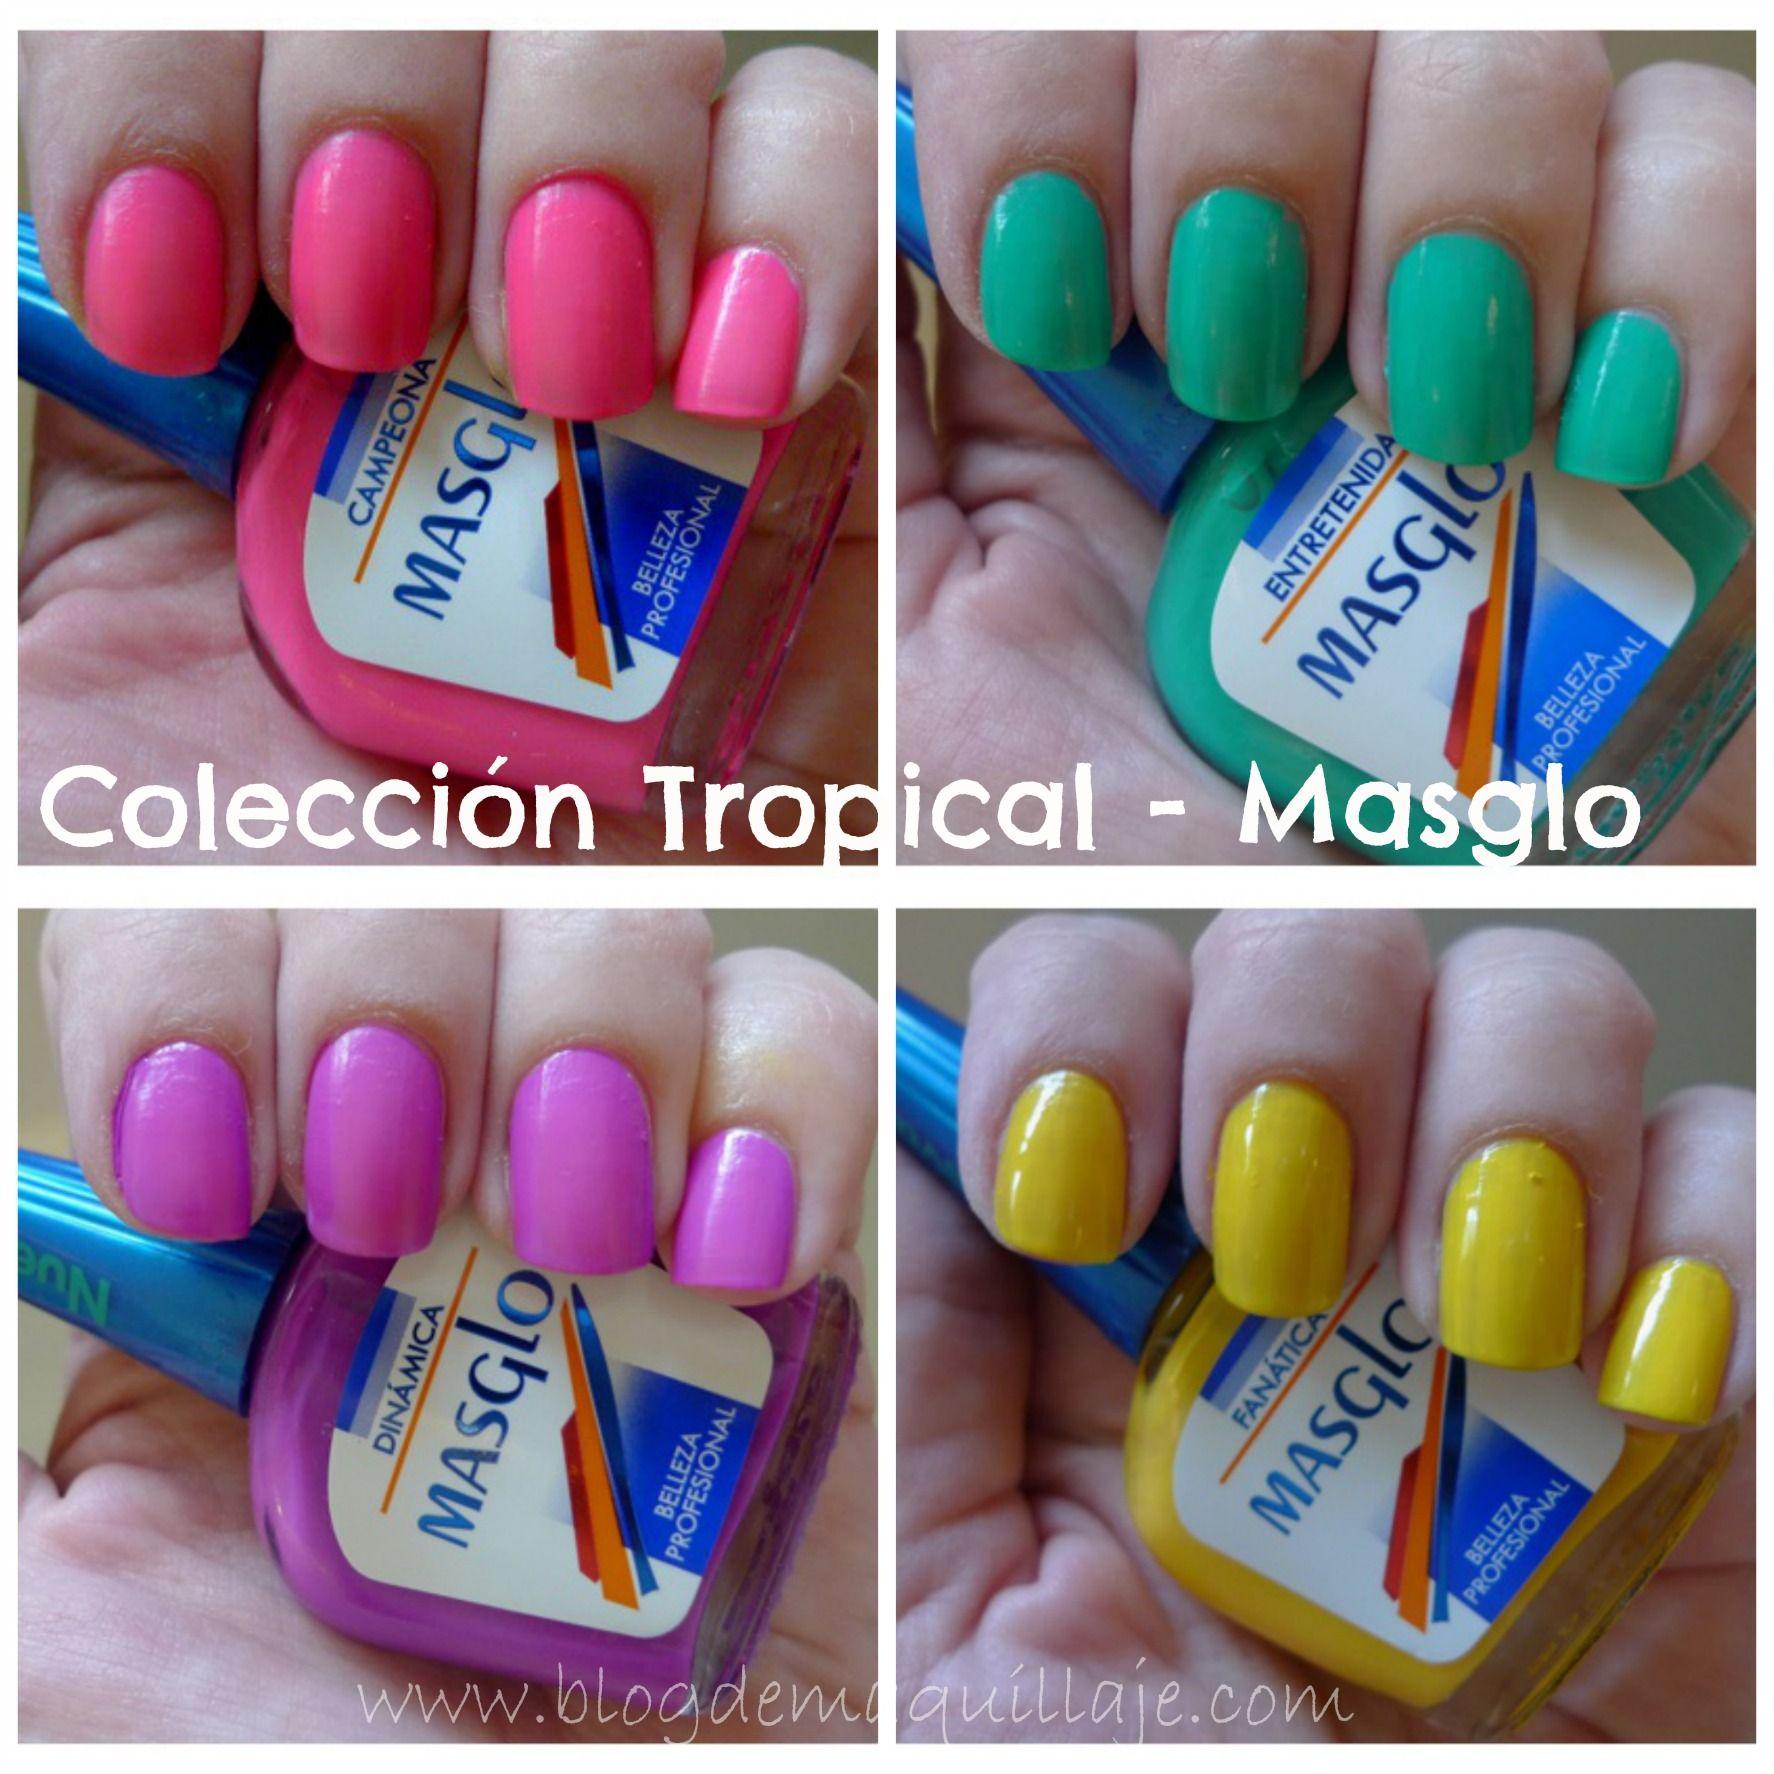 Colección de manicura Tropical de Masglo -Blog de Maquillaje ...